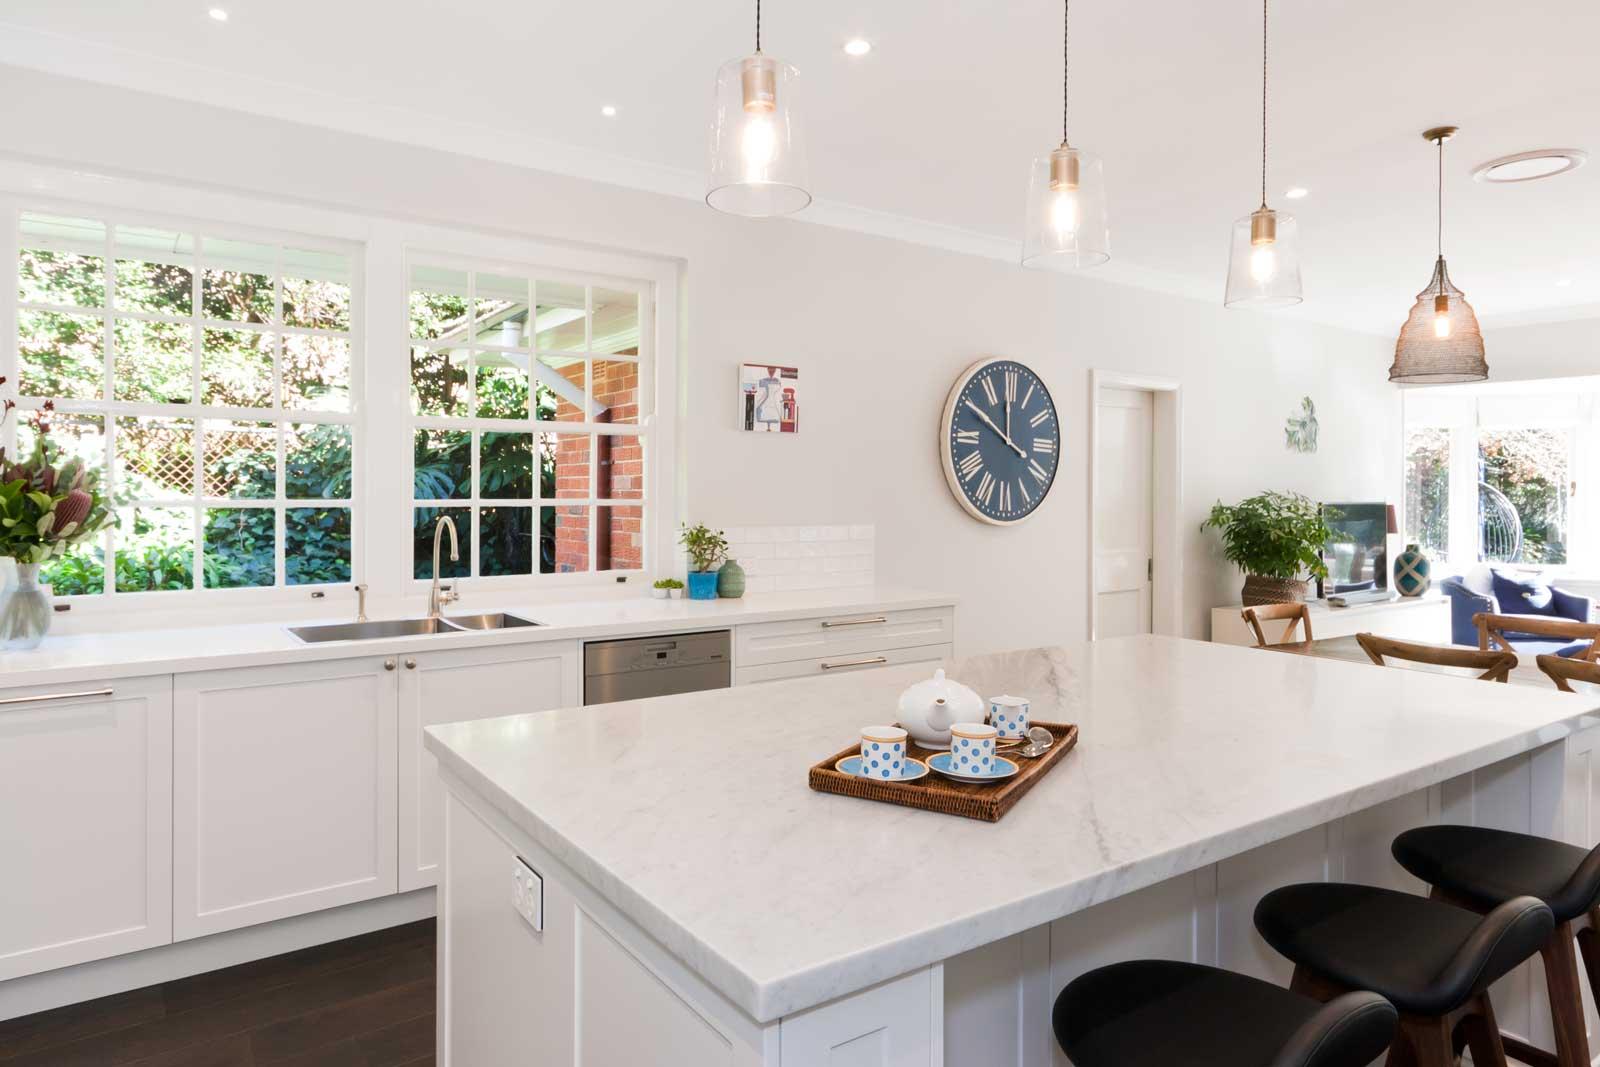 caesarstone benchtop miele appliances hamptons kitchen design white polyurethane cabinets blum hardware shaker doors